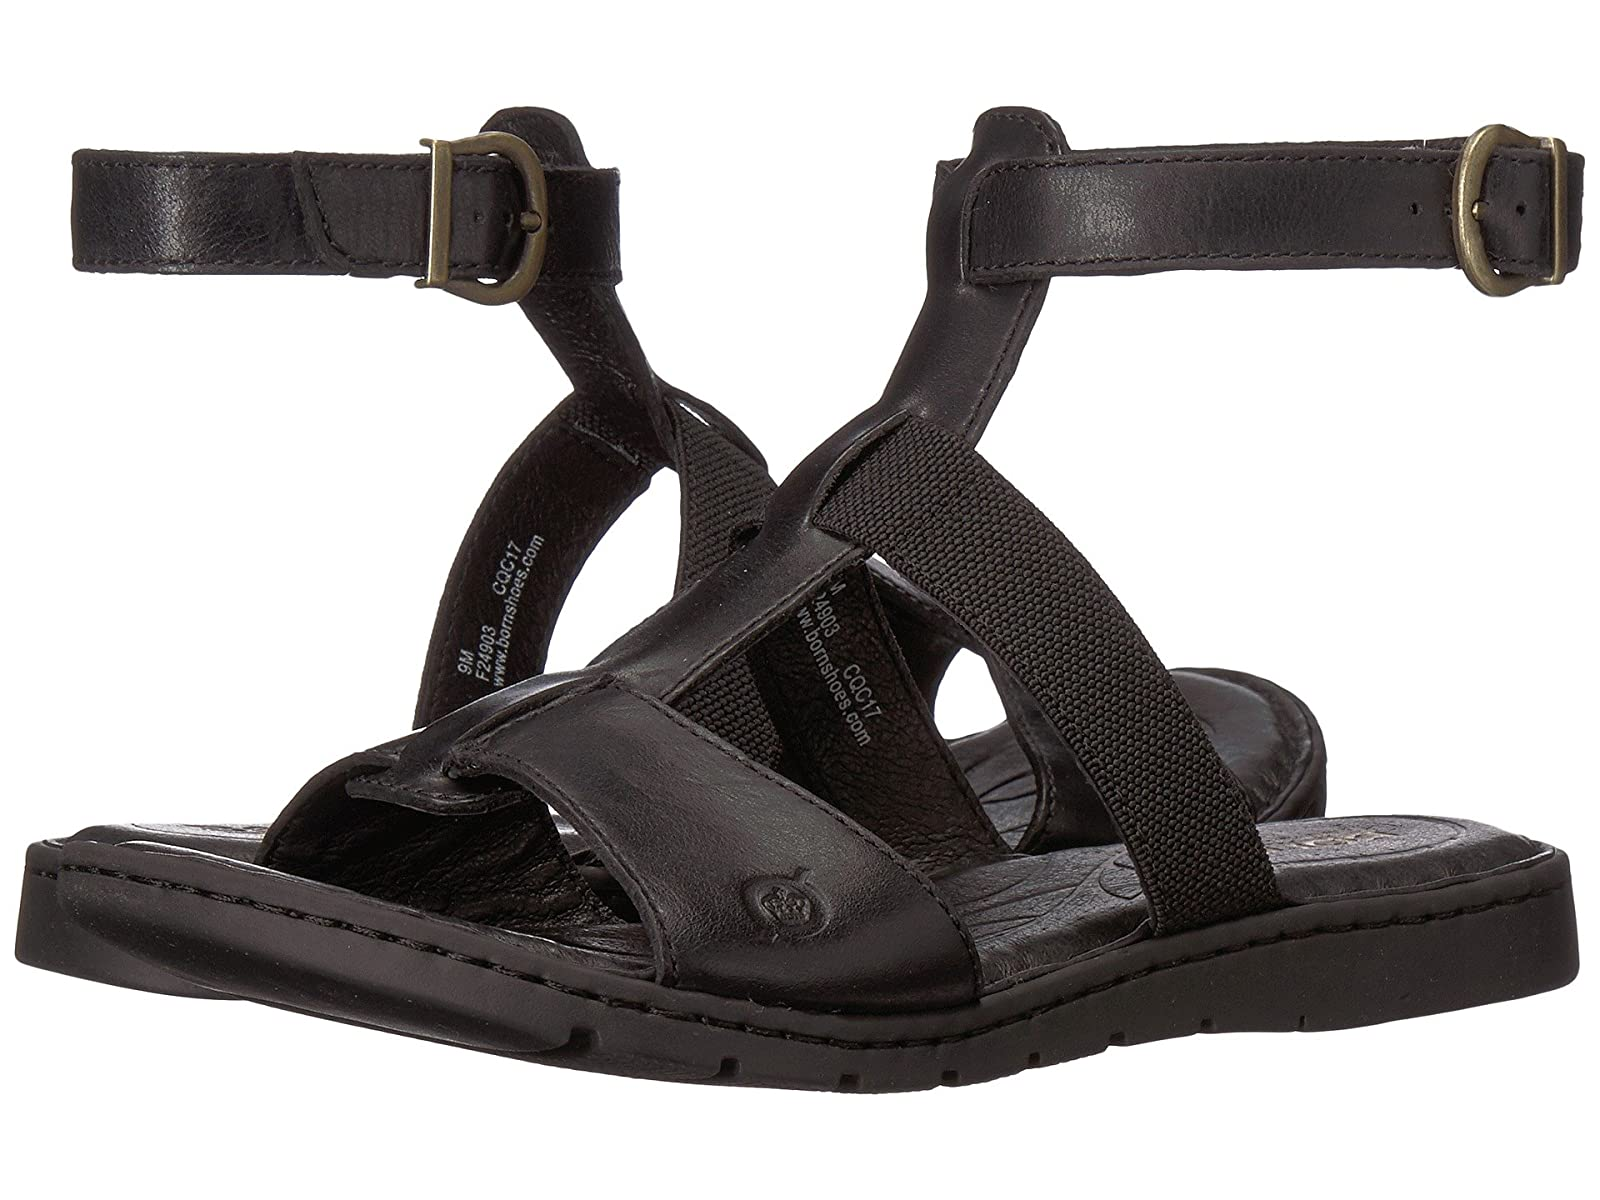 Born SofiaCheap and distinctive eye-catching shoes